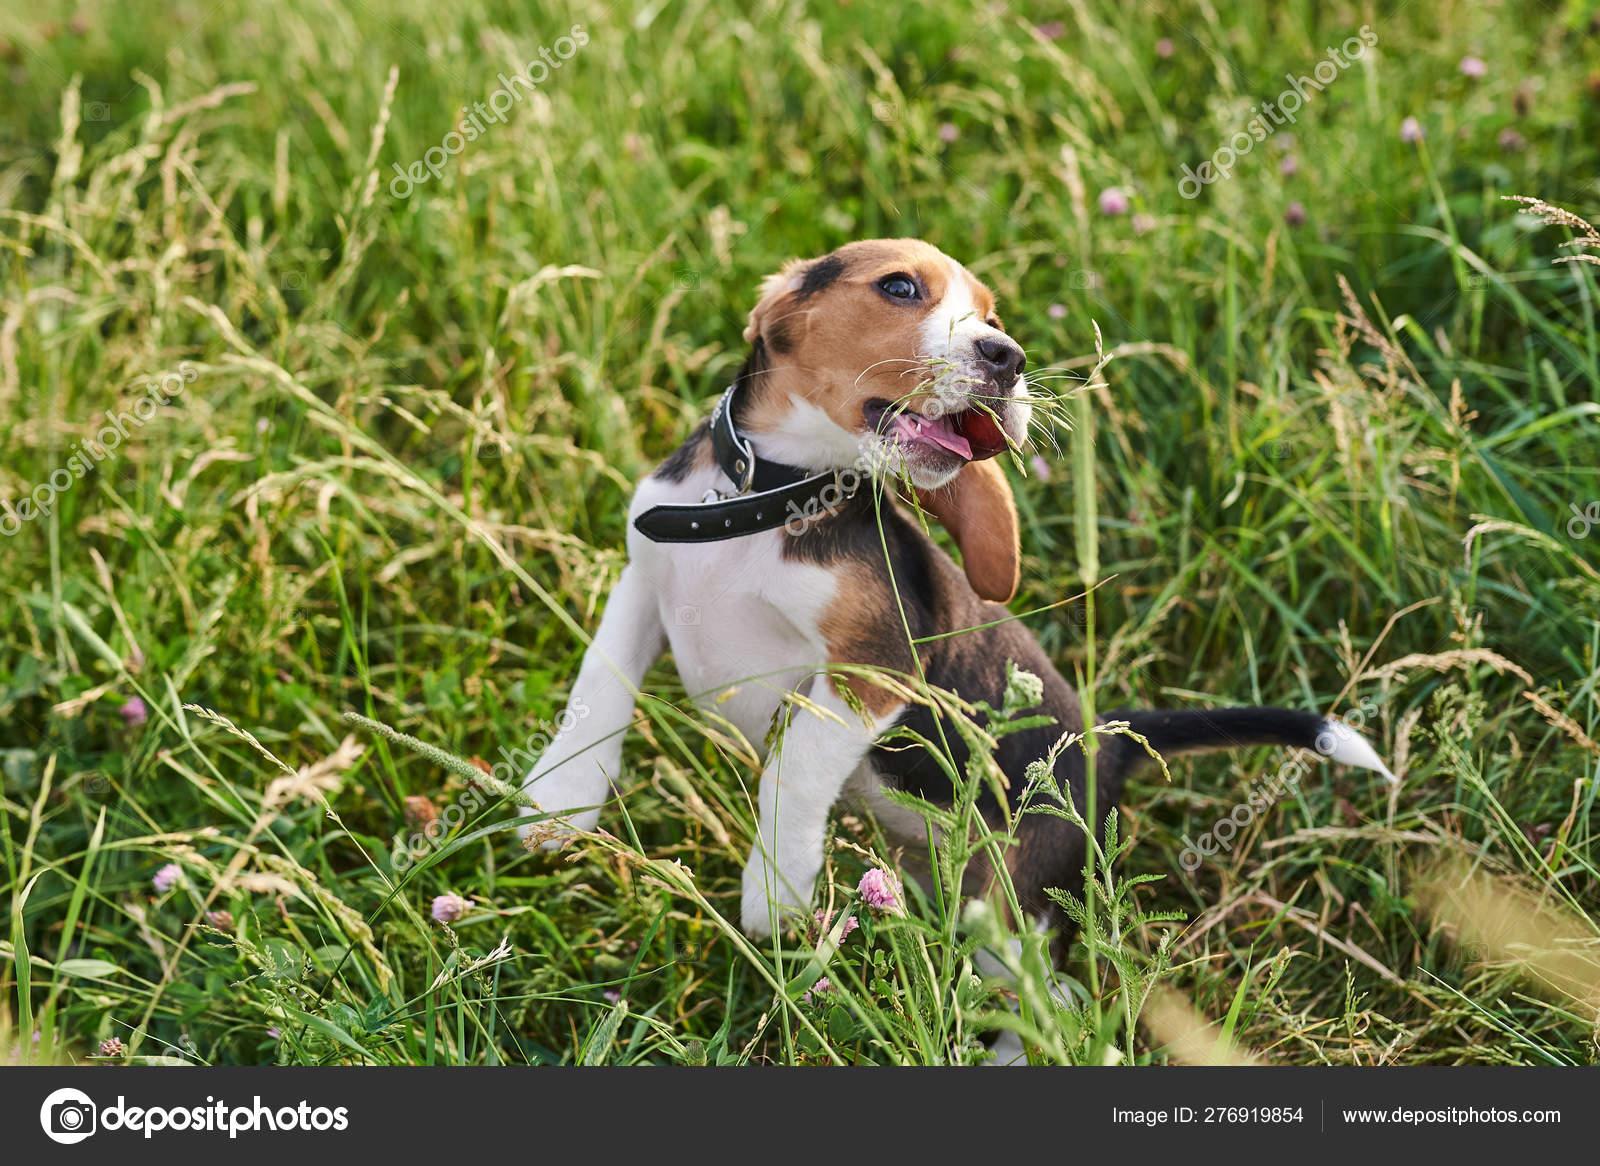 Beagle Puppy Funny Bounces In The Grass Stock Photo C Archangel80889 Yandex Ru 276919854